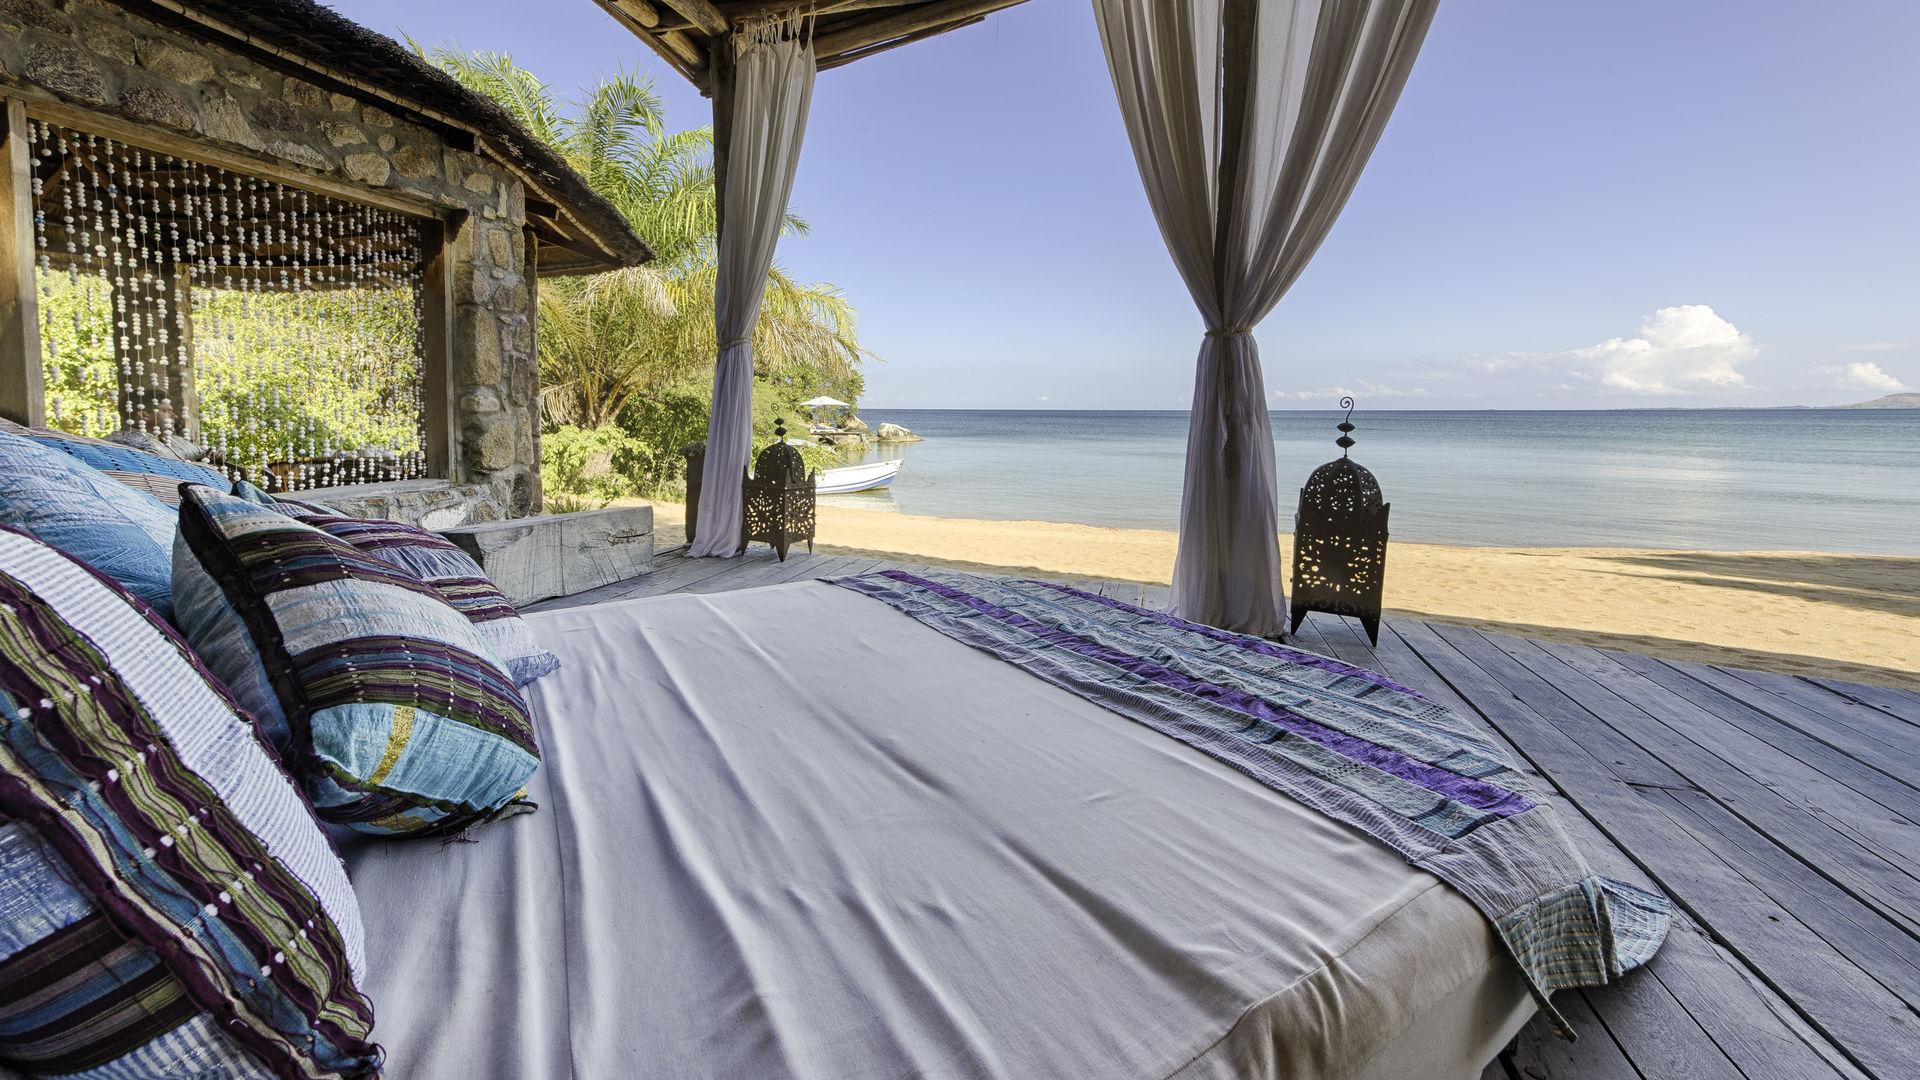 Verlengingen Malawi - jeepsafari, bootsafari, wandelsafari, nachtsafari, kanosafari